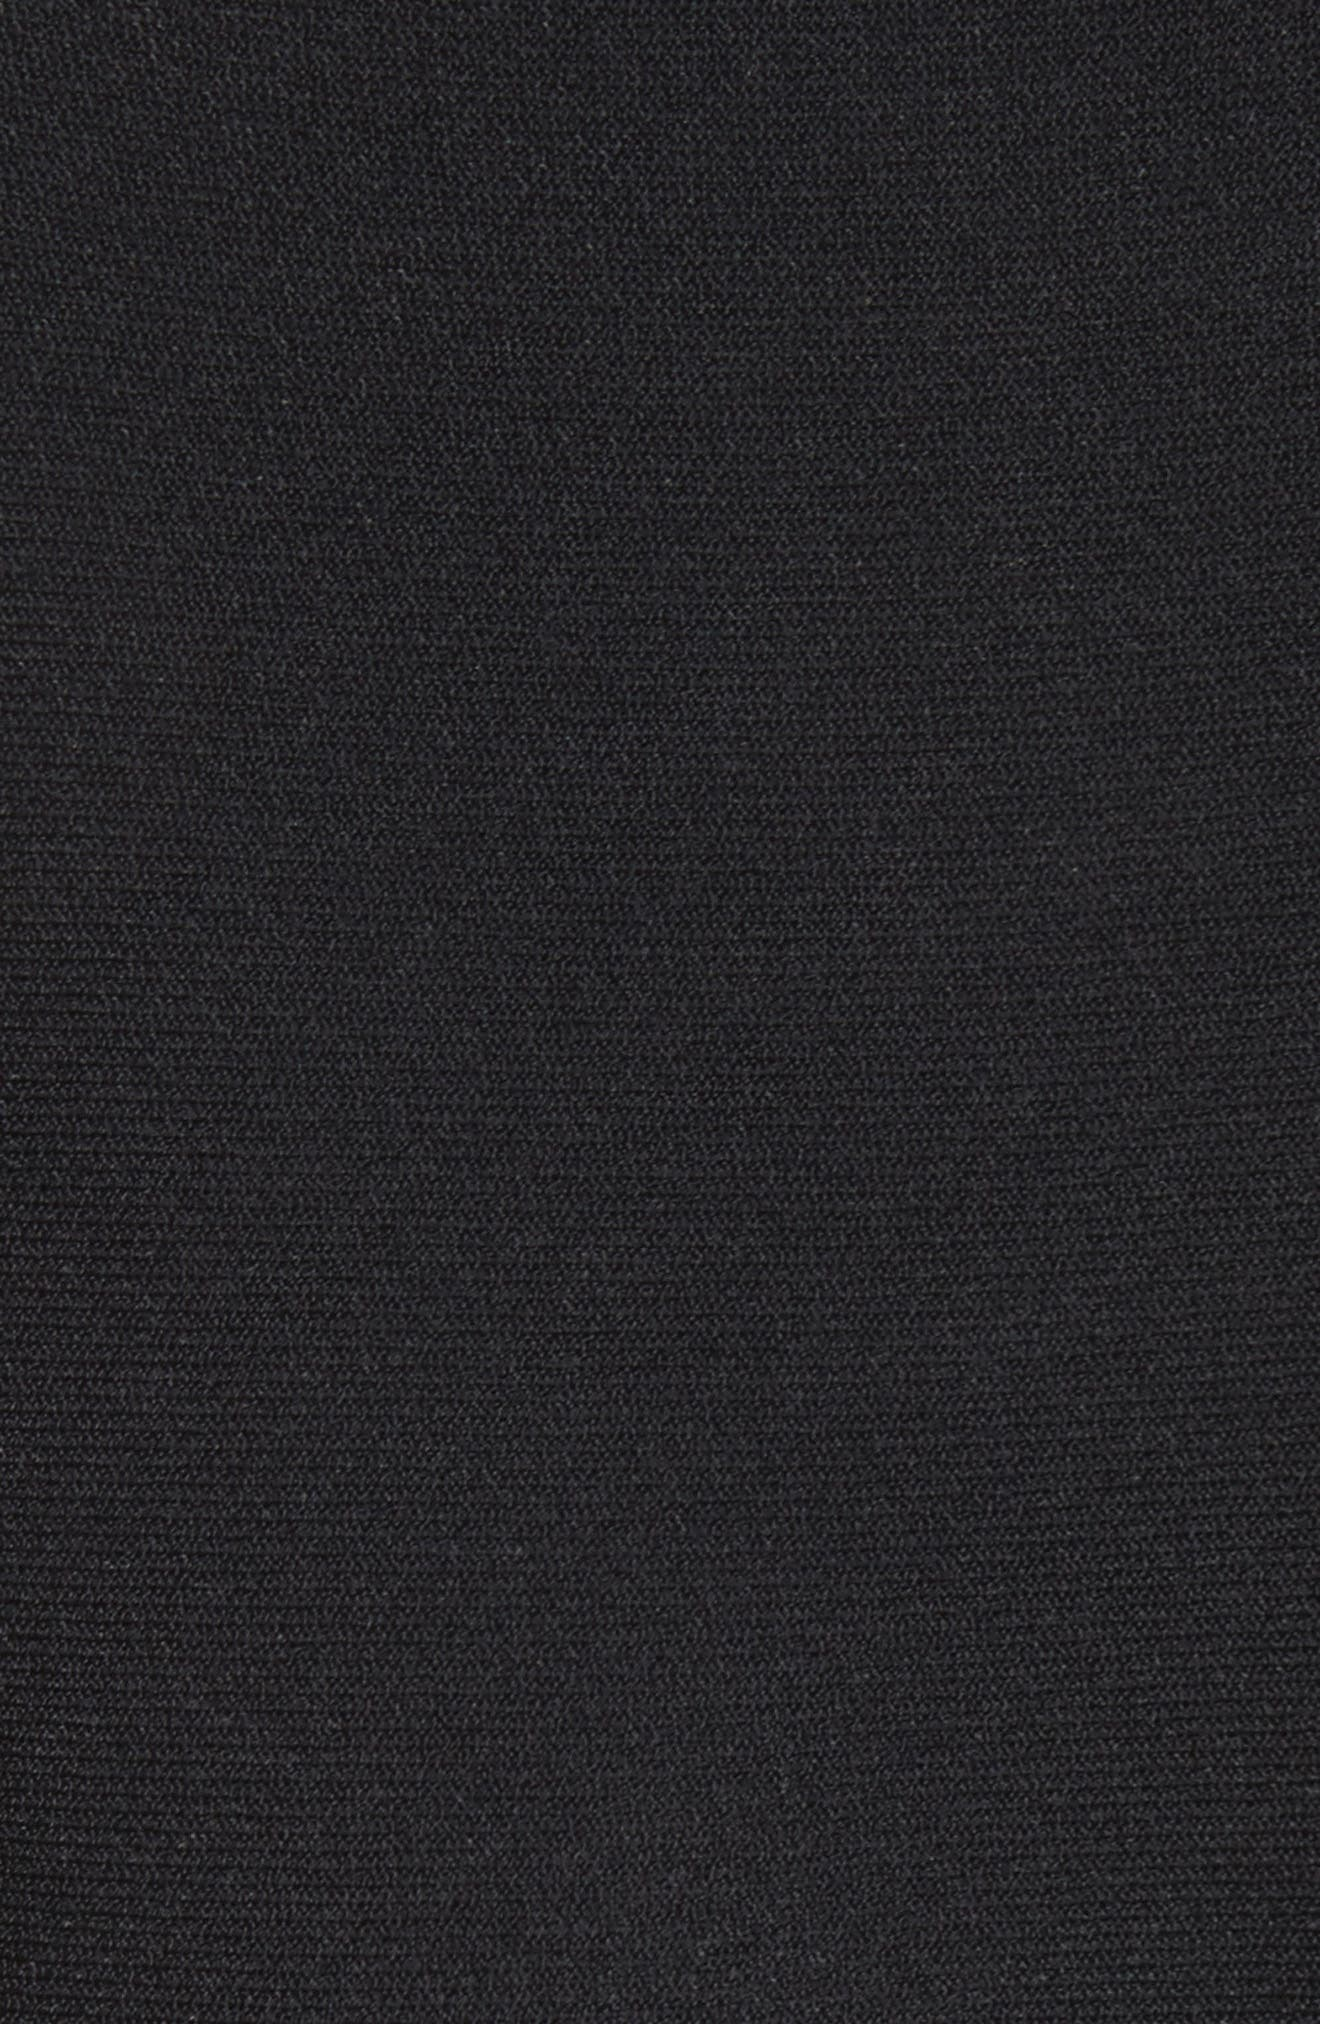 Lace Side Contrast Shift Dress,                             Alternate thumbnail 6, color,                             IVORY/ BLACK